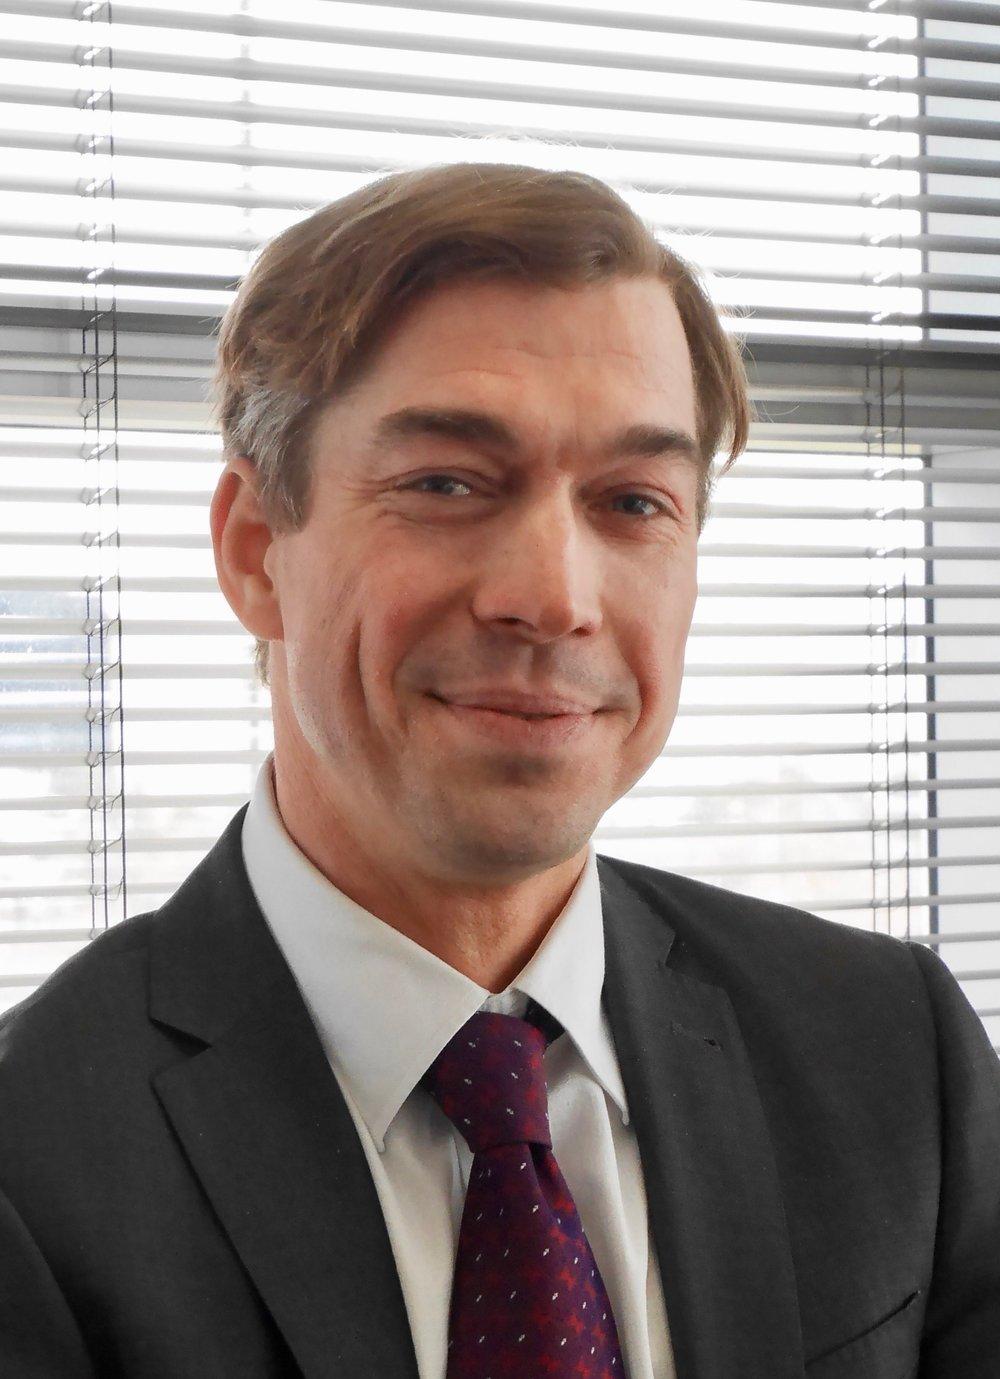 Marc Schnekenburger - NTRI Research Fellow